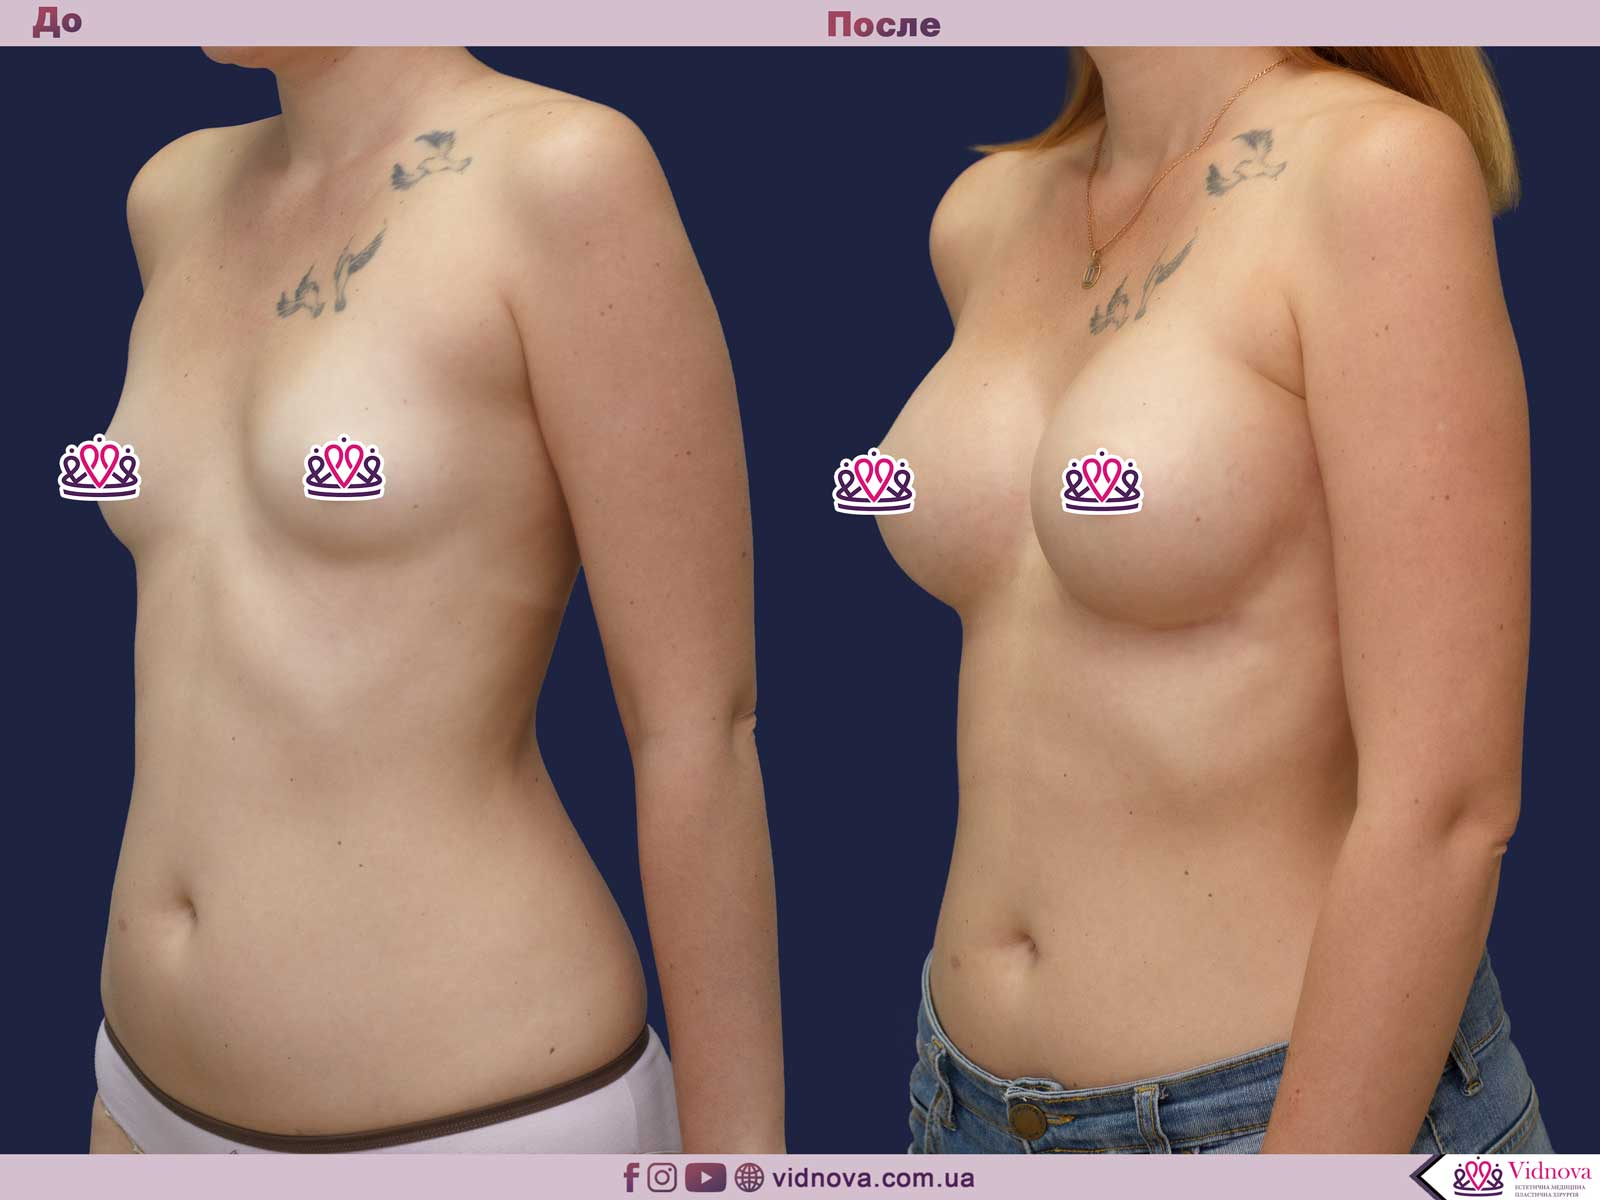 Увеличение груди: Фото ДО и ПОСЛЕ - Пример №61-2 - Клиника Vidnova